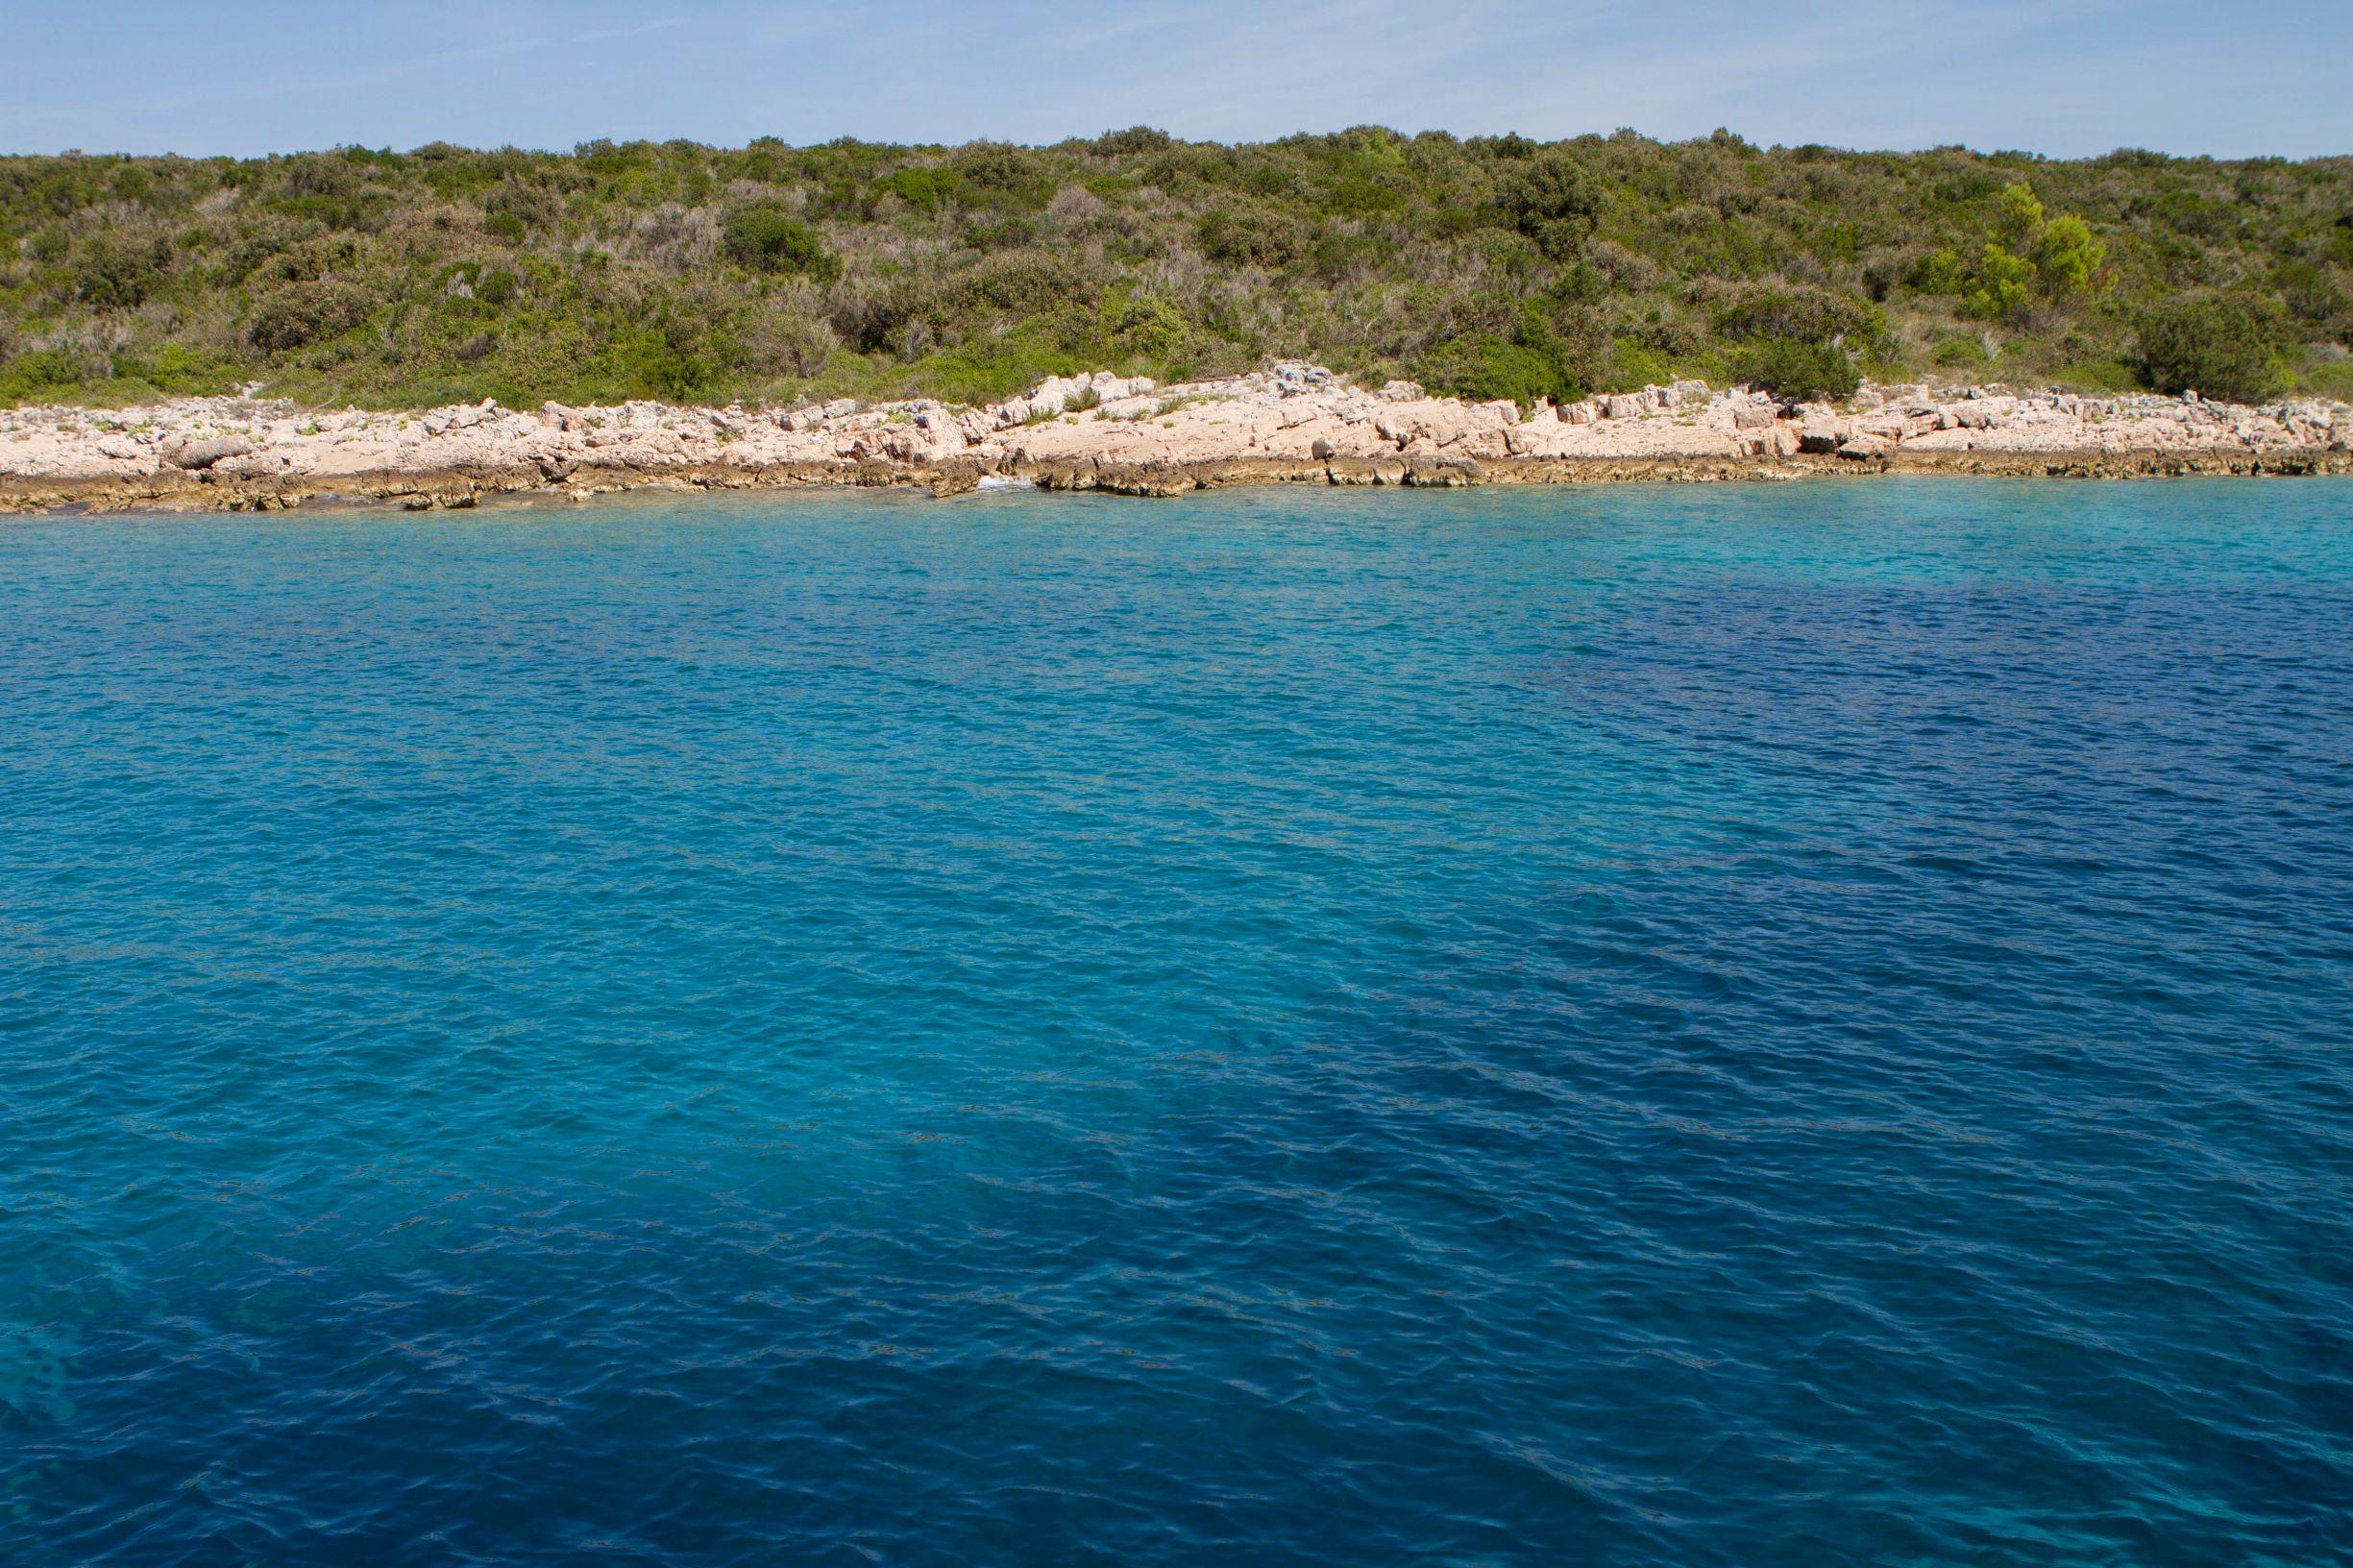 Beautiful water_Adriatic_Dalmatia Coast